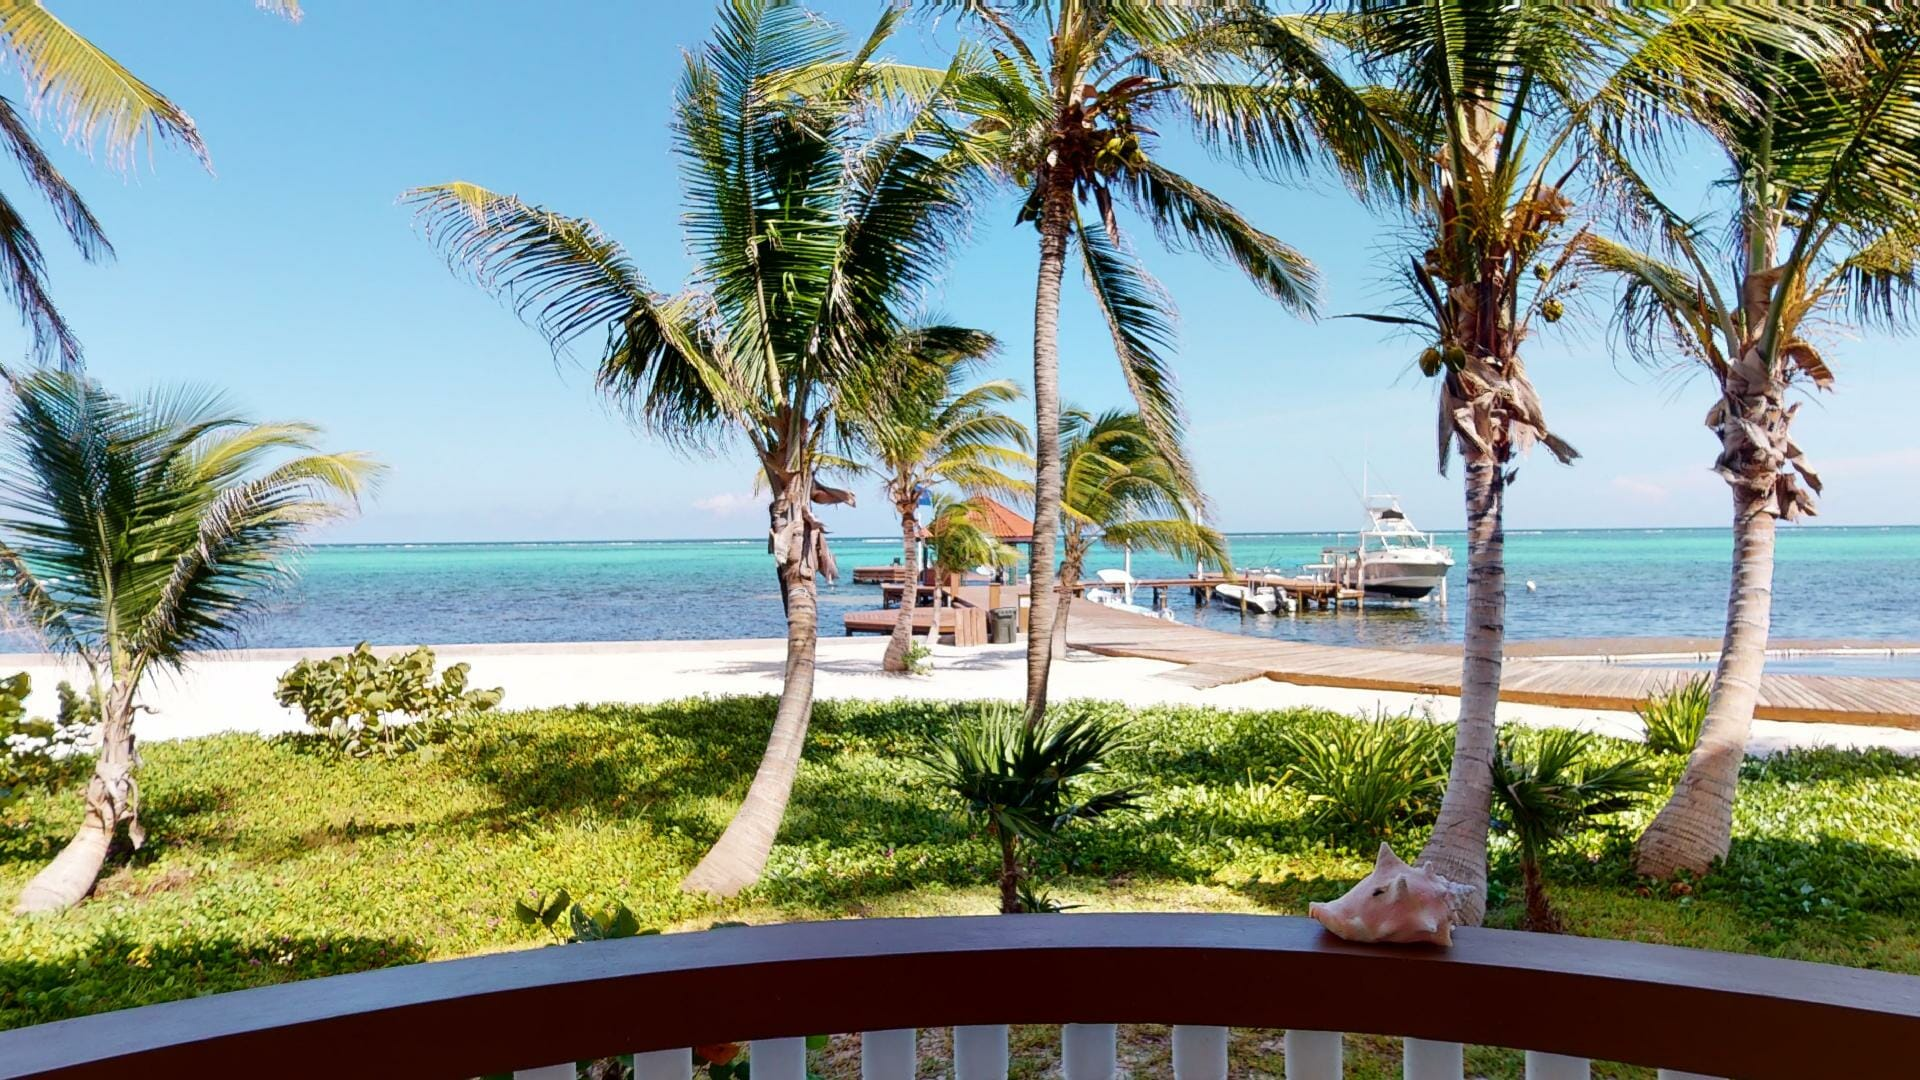 Grand Caribe : 2BR/2BA Ocean Front : A2